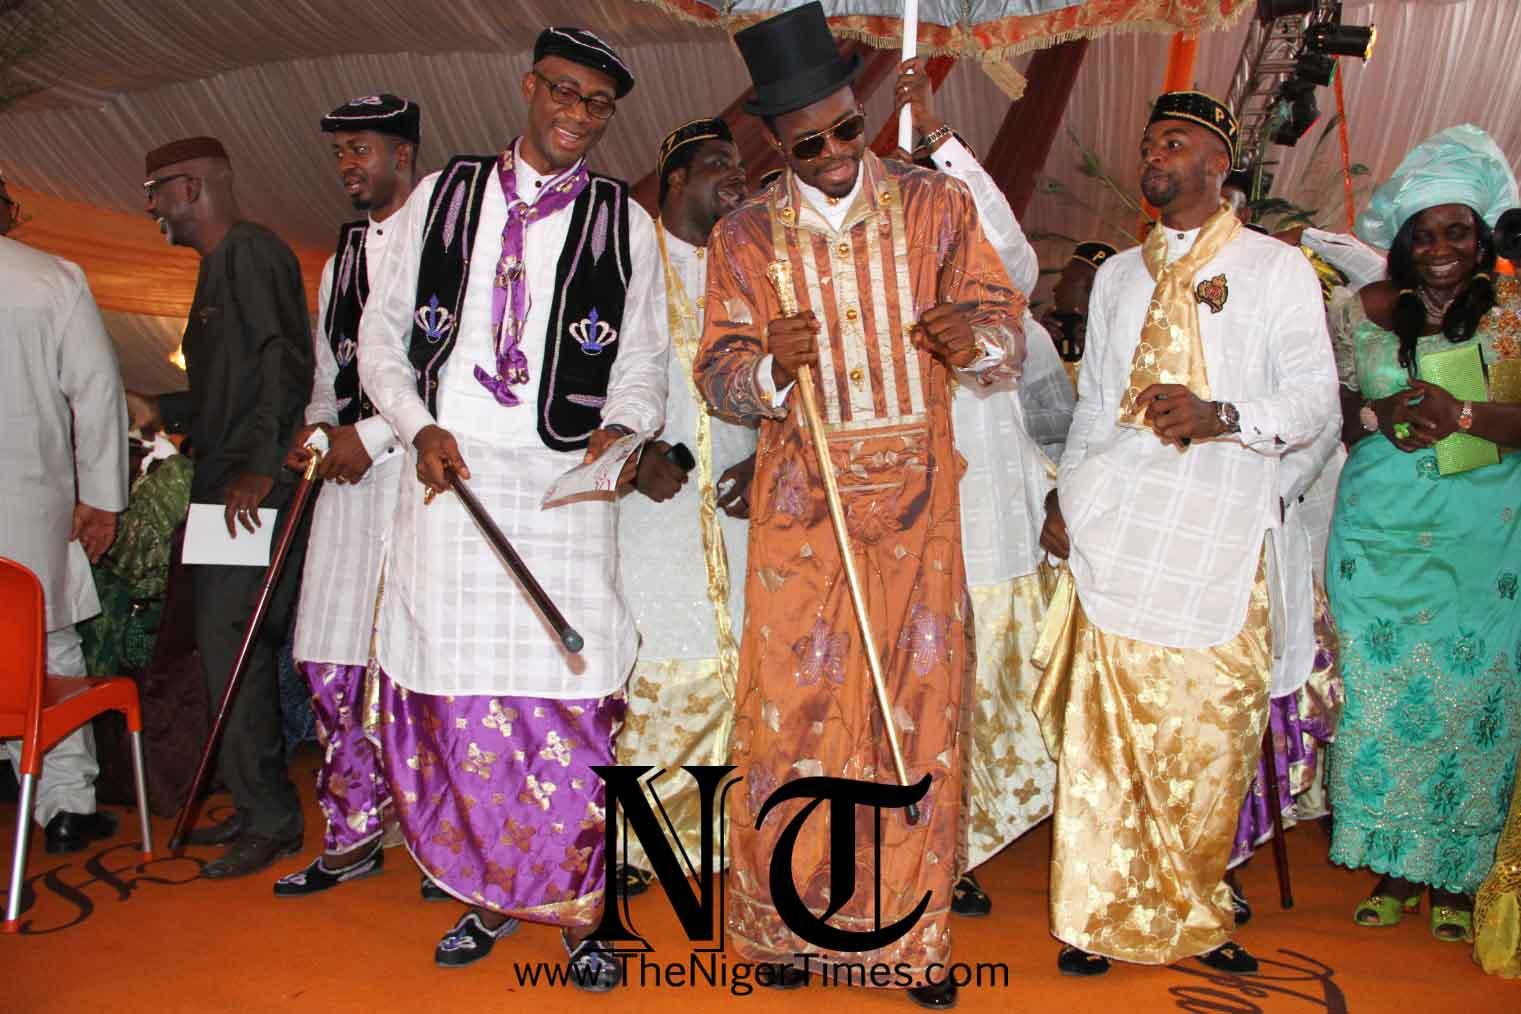 The-niger-times-godswill-faith-wedding-Traditional-Bayelsa-goddluck-11.jpg